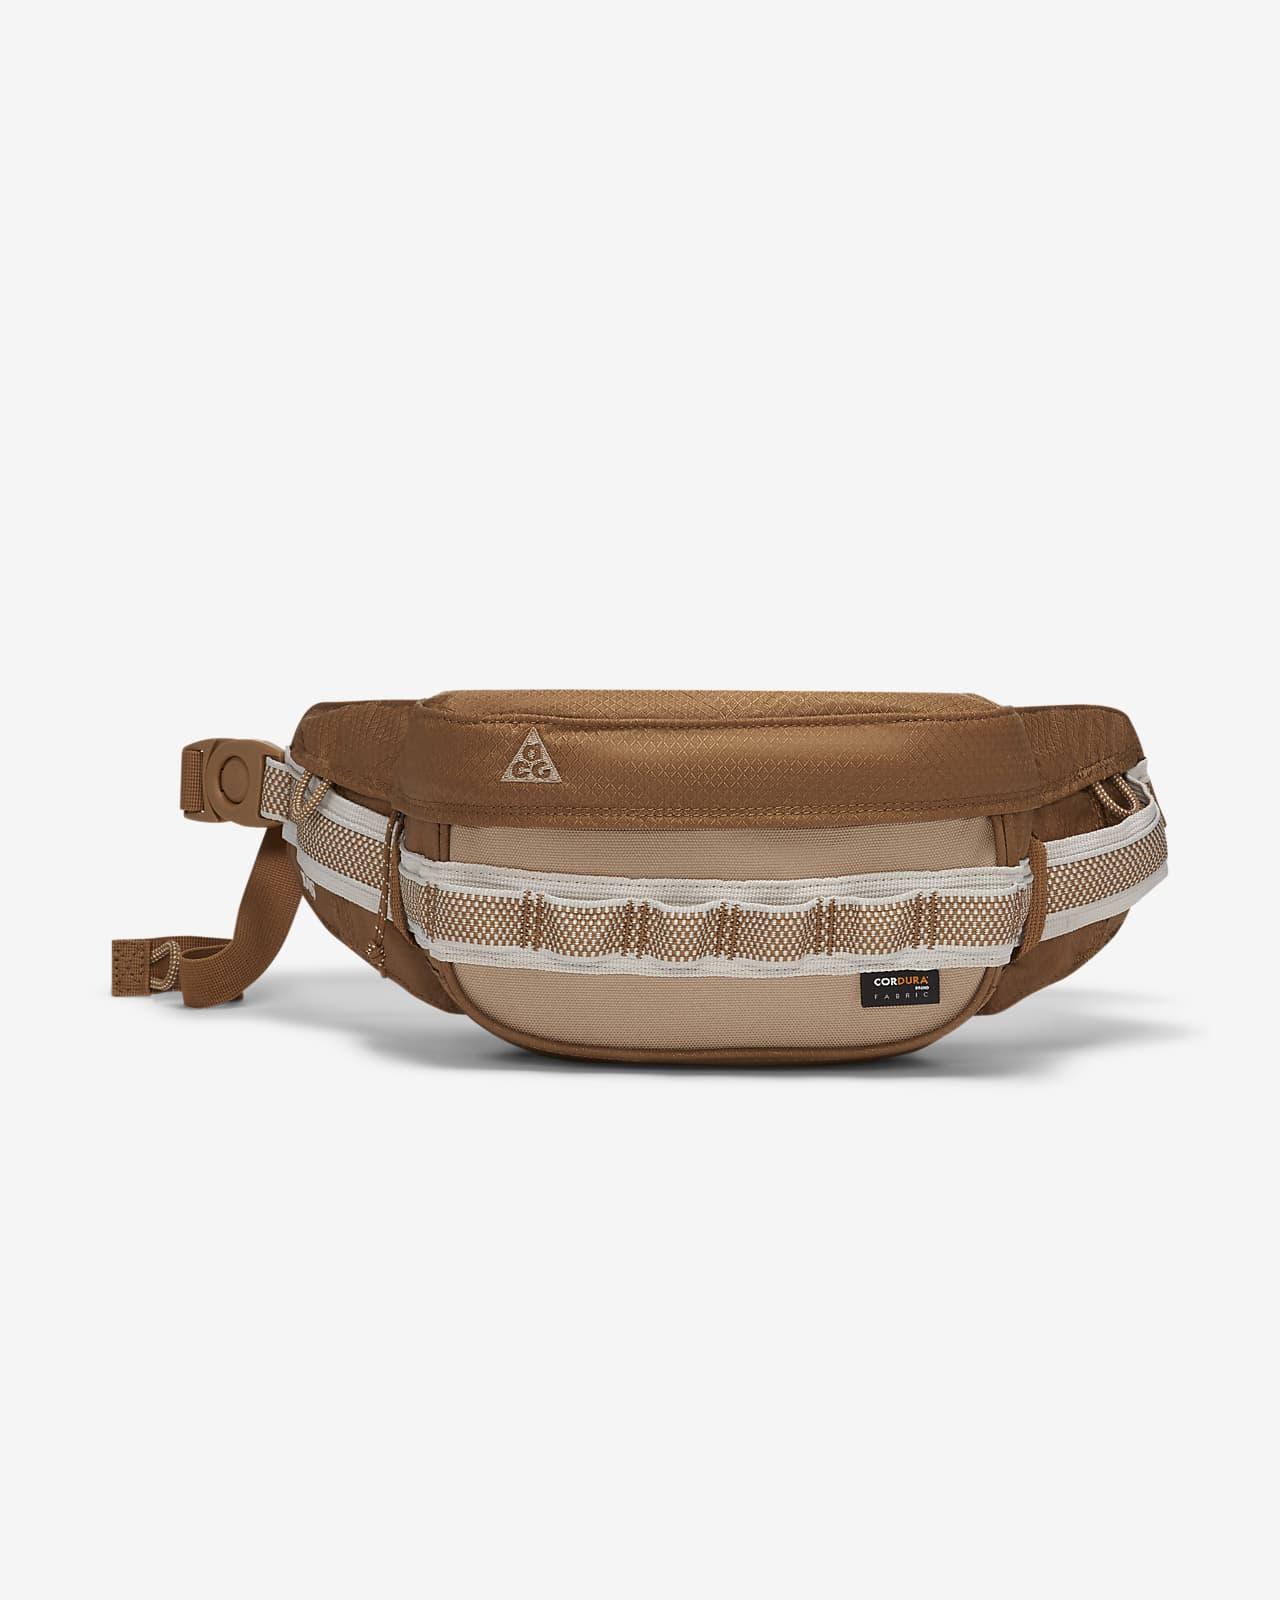 Nike ACG Karst Small Items Bag